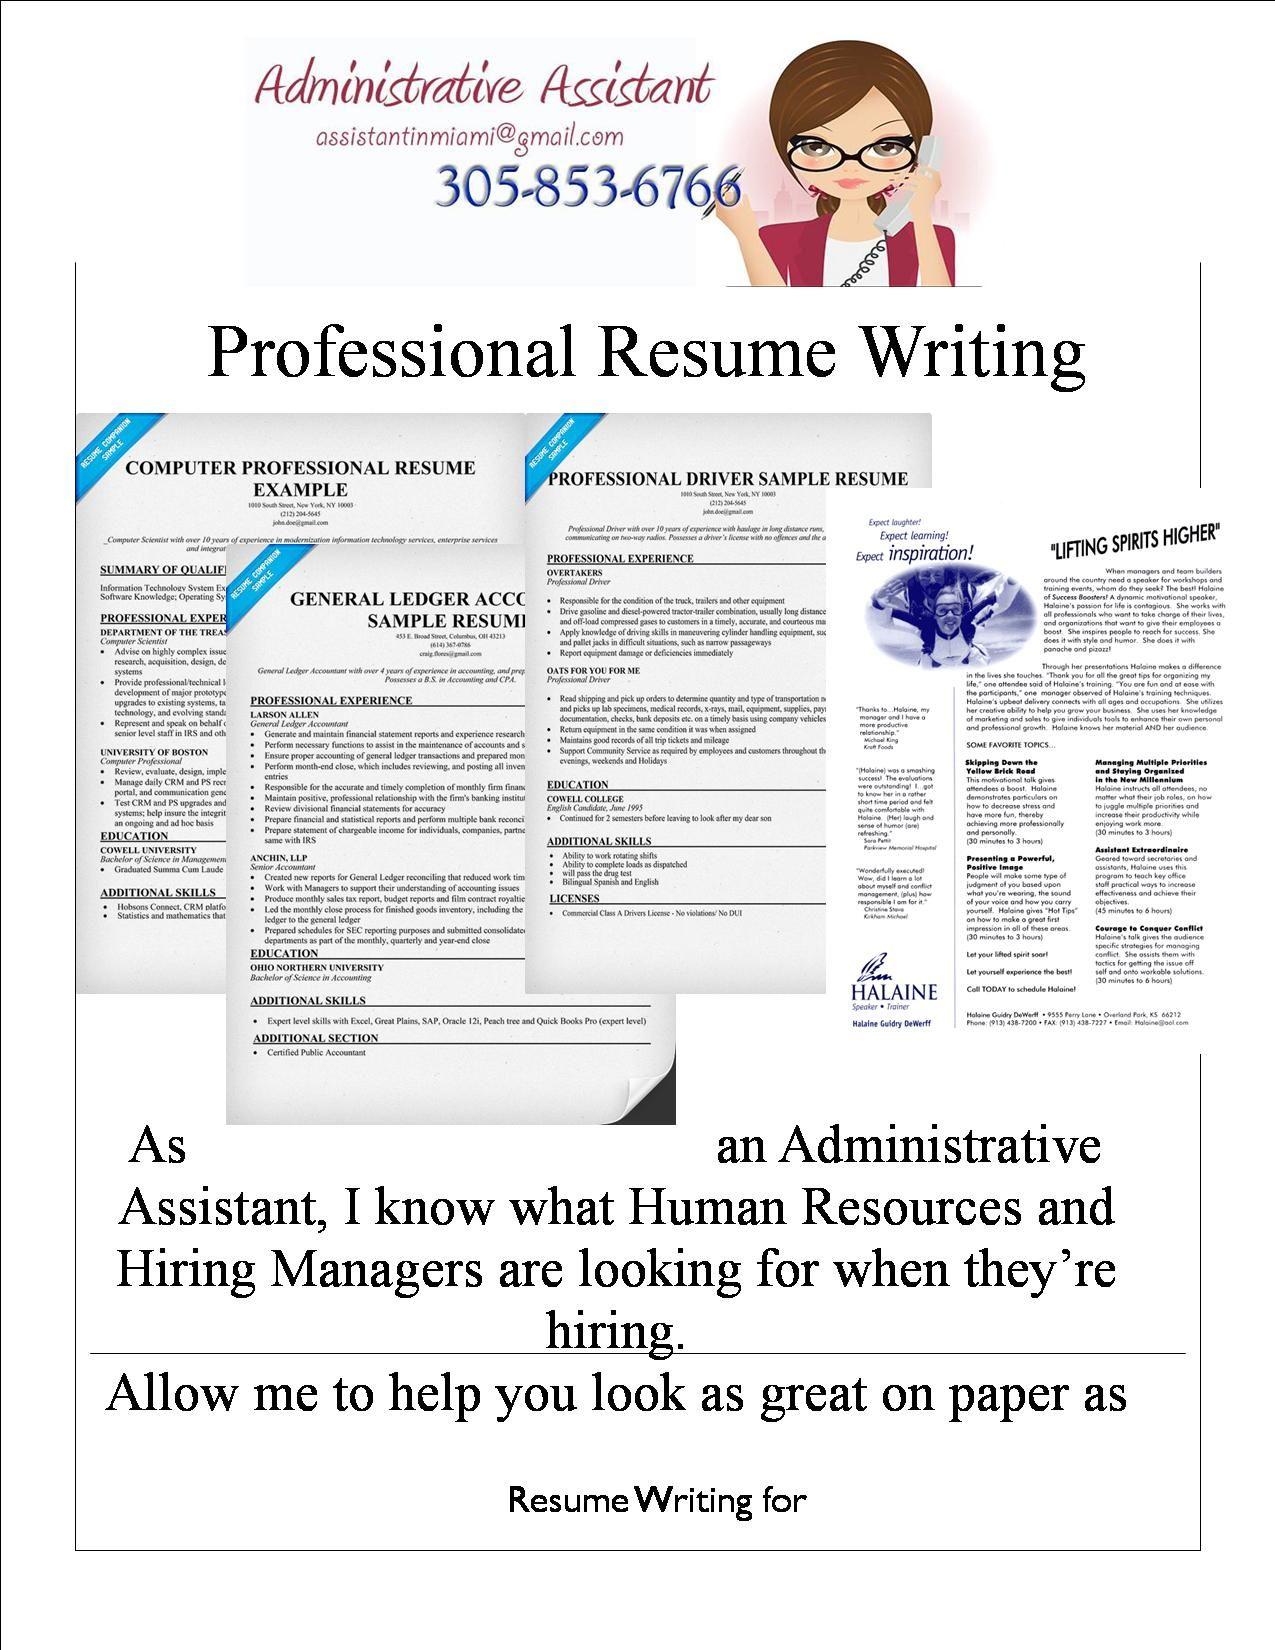 Professional Resume Writing Service Professional Resume Writing Services  Freelance Administrative